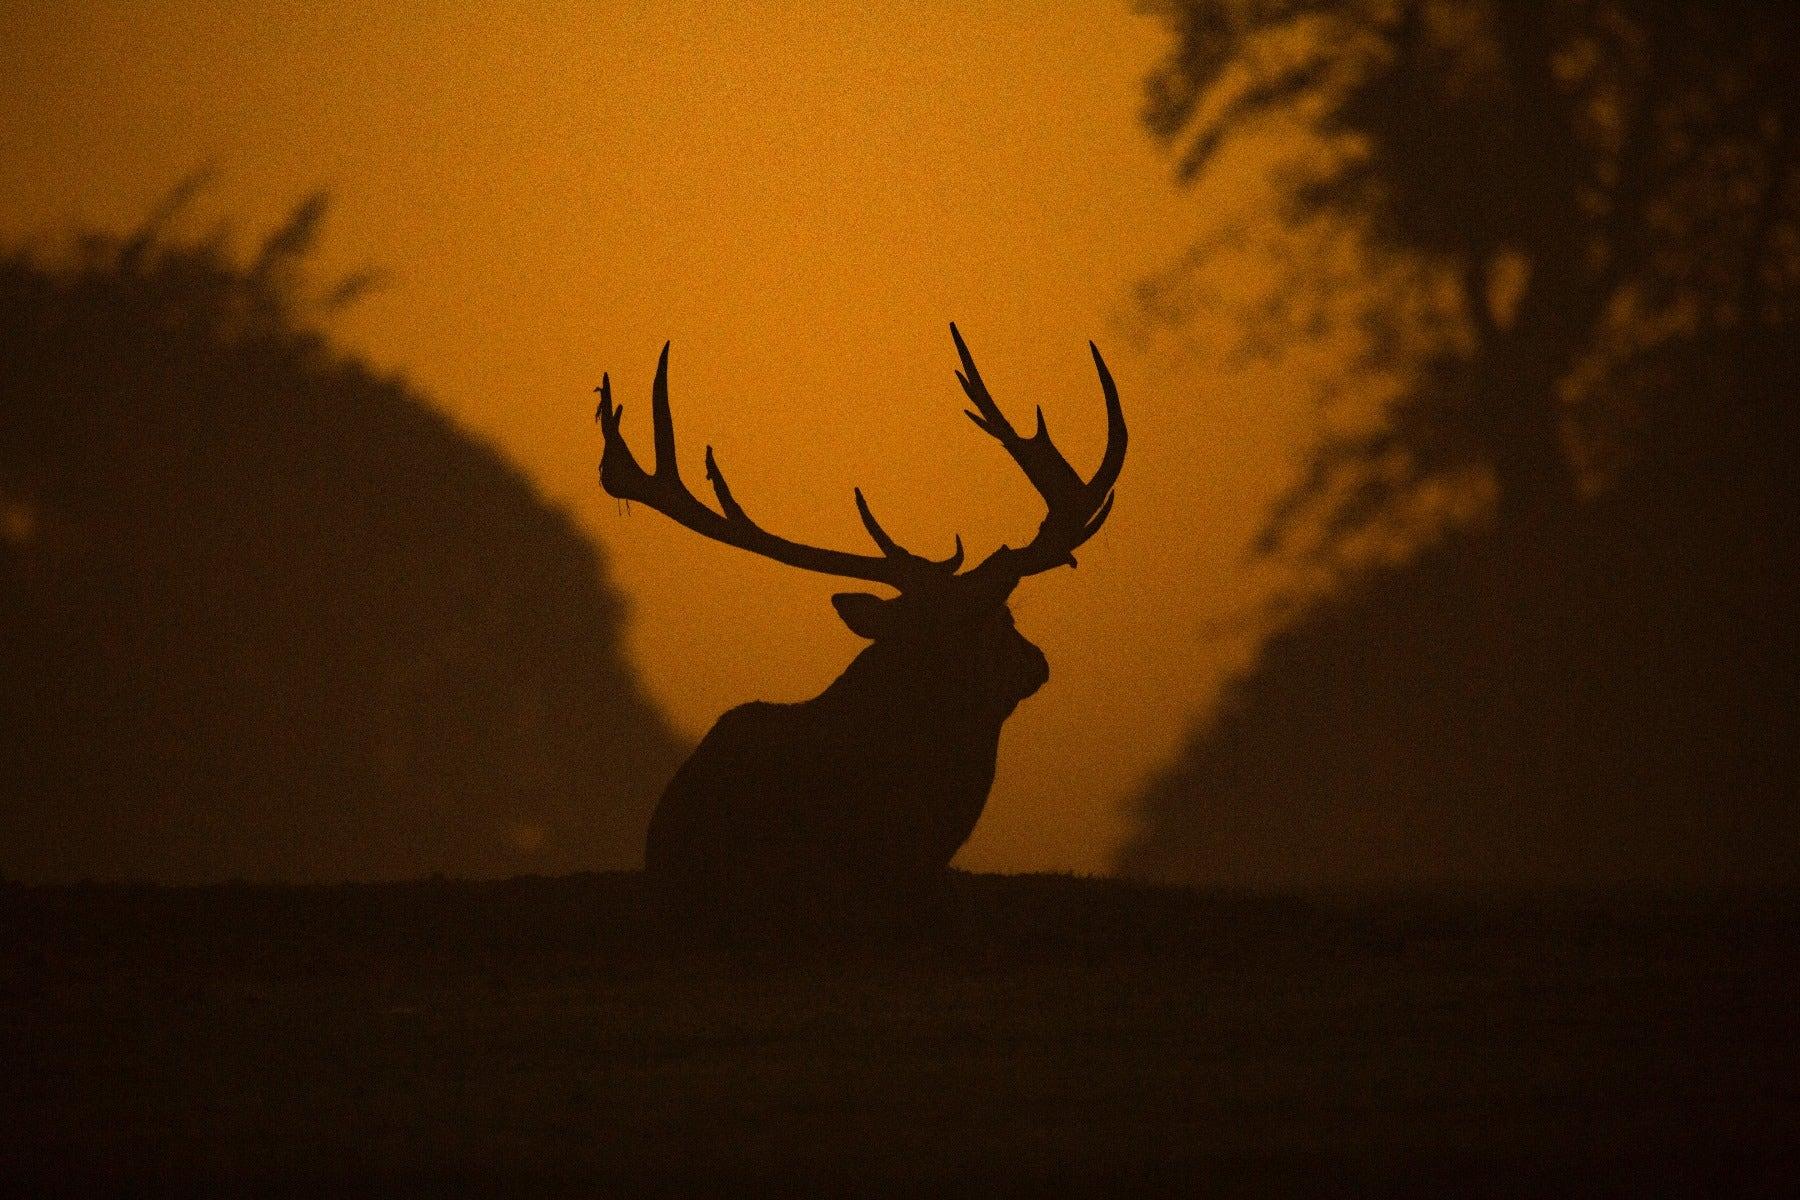 Silhouette of an elk at sundown